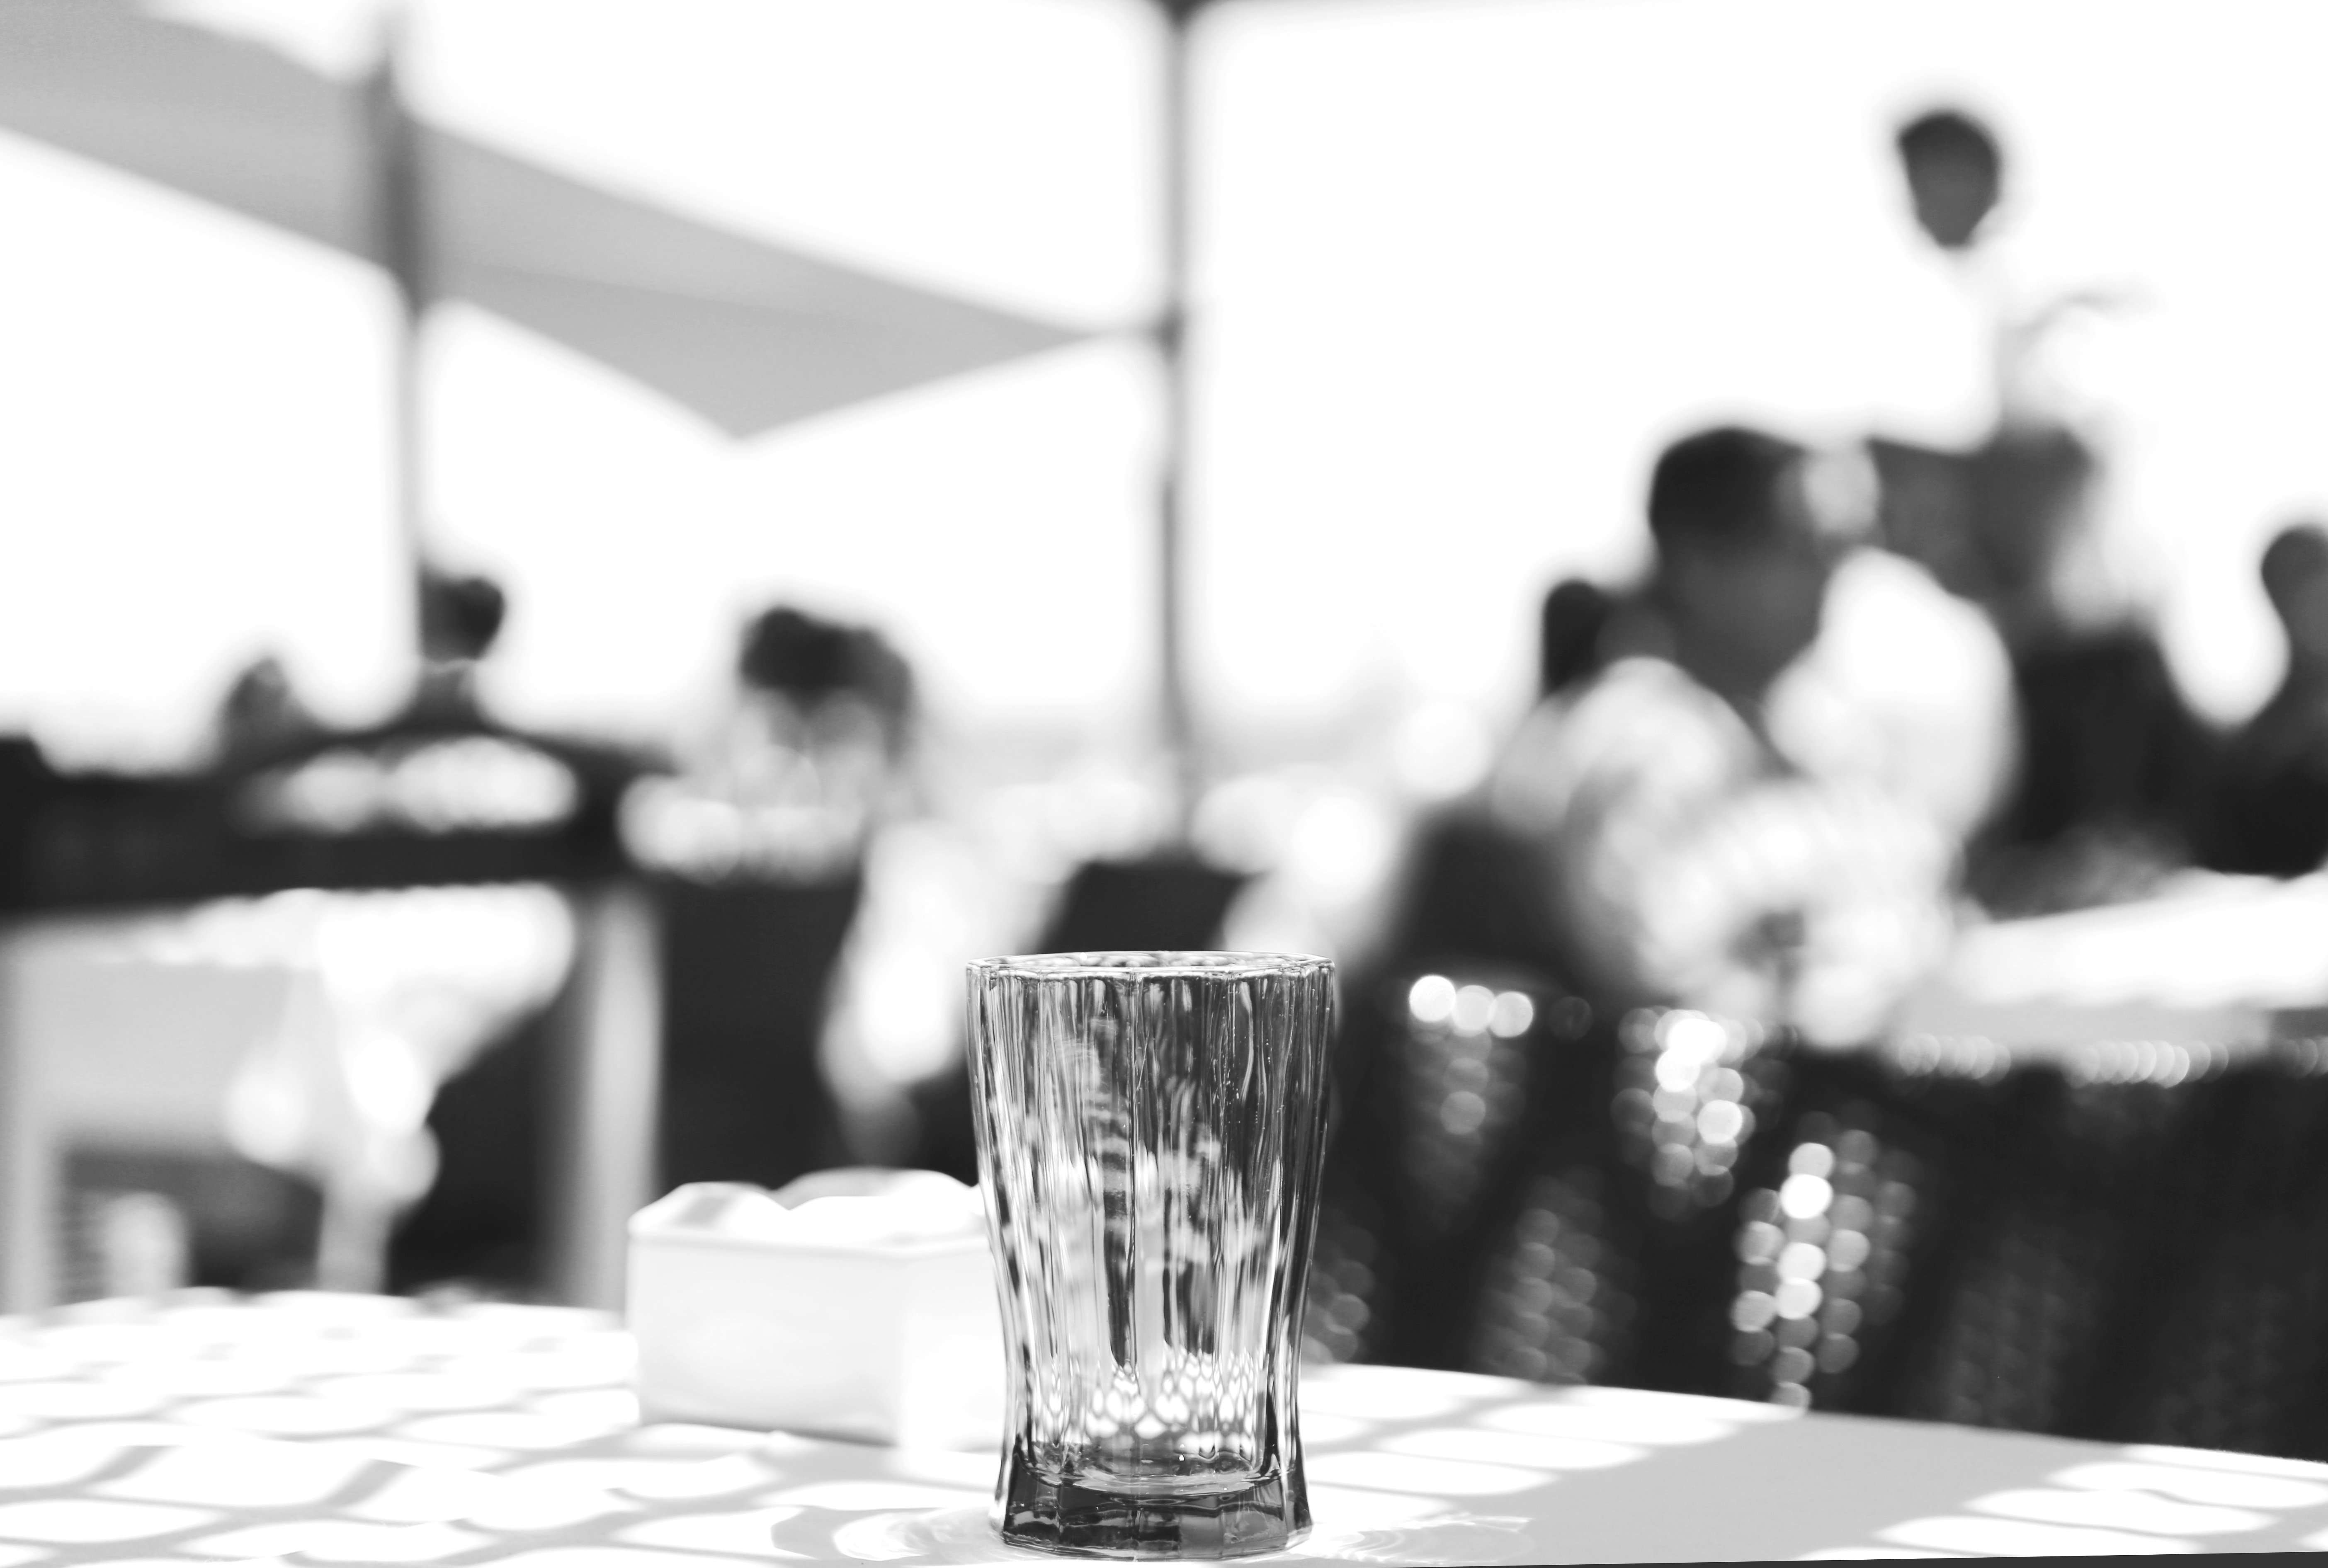 2016_10_life-of-pix-free-stock-glass-terrace-peoples-leeroy.jpg